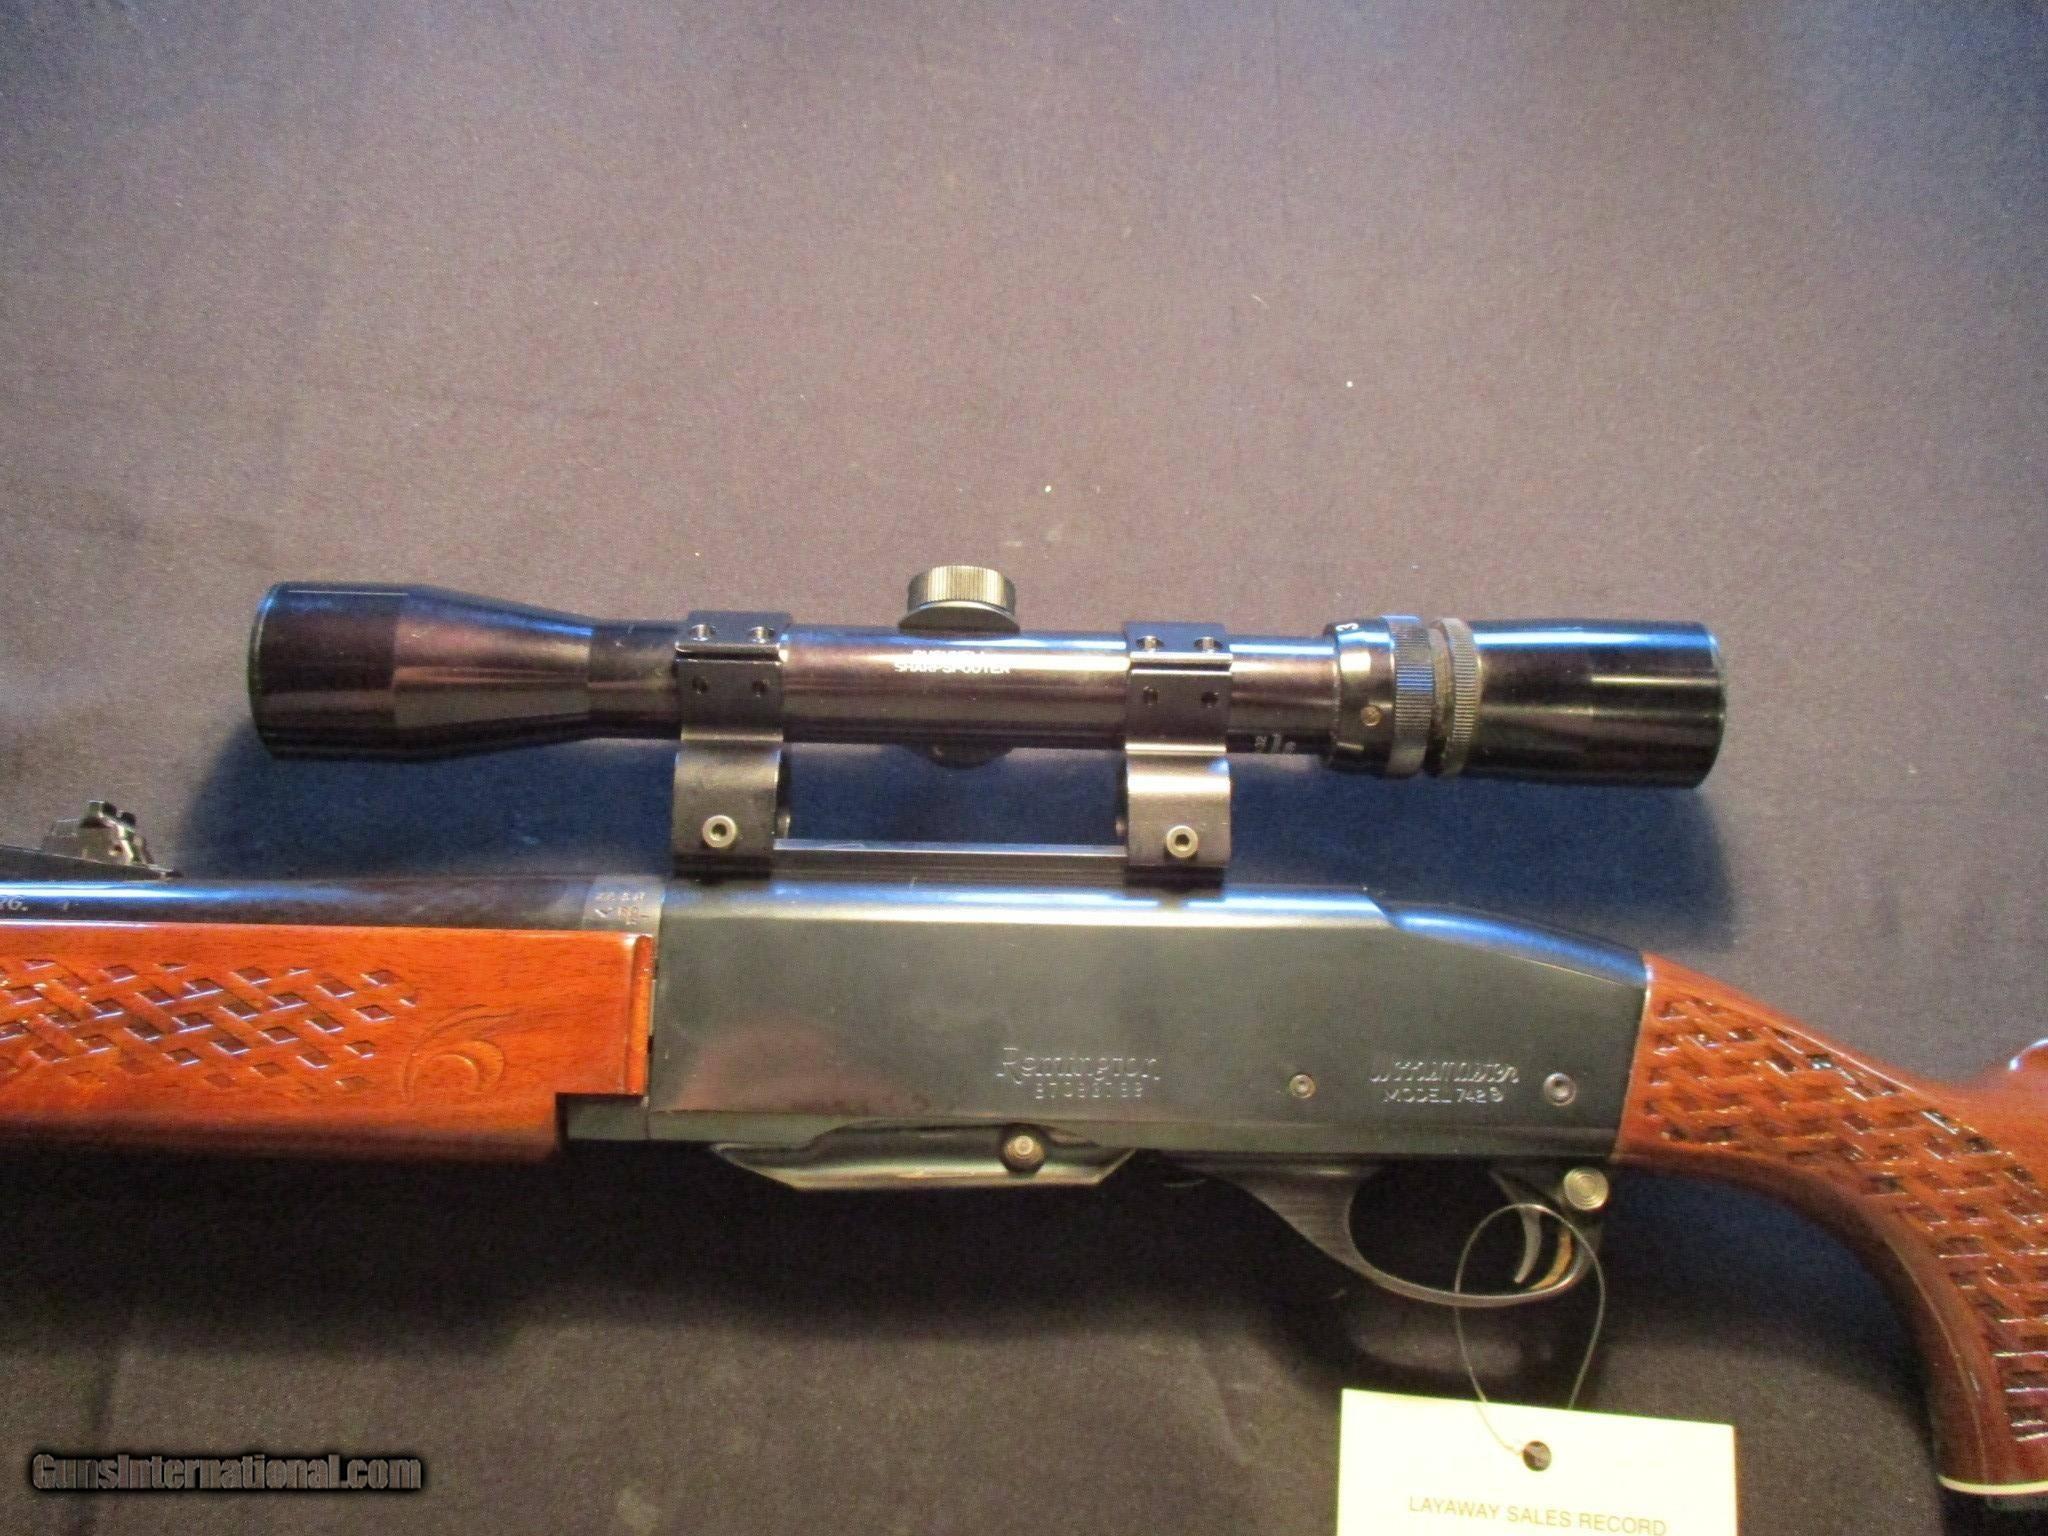 Woodsmaster problems 742 remington Remington Model